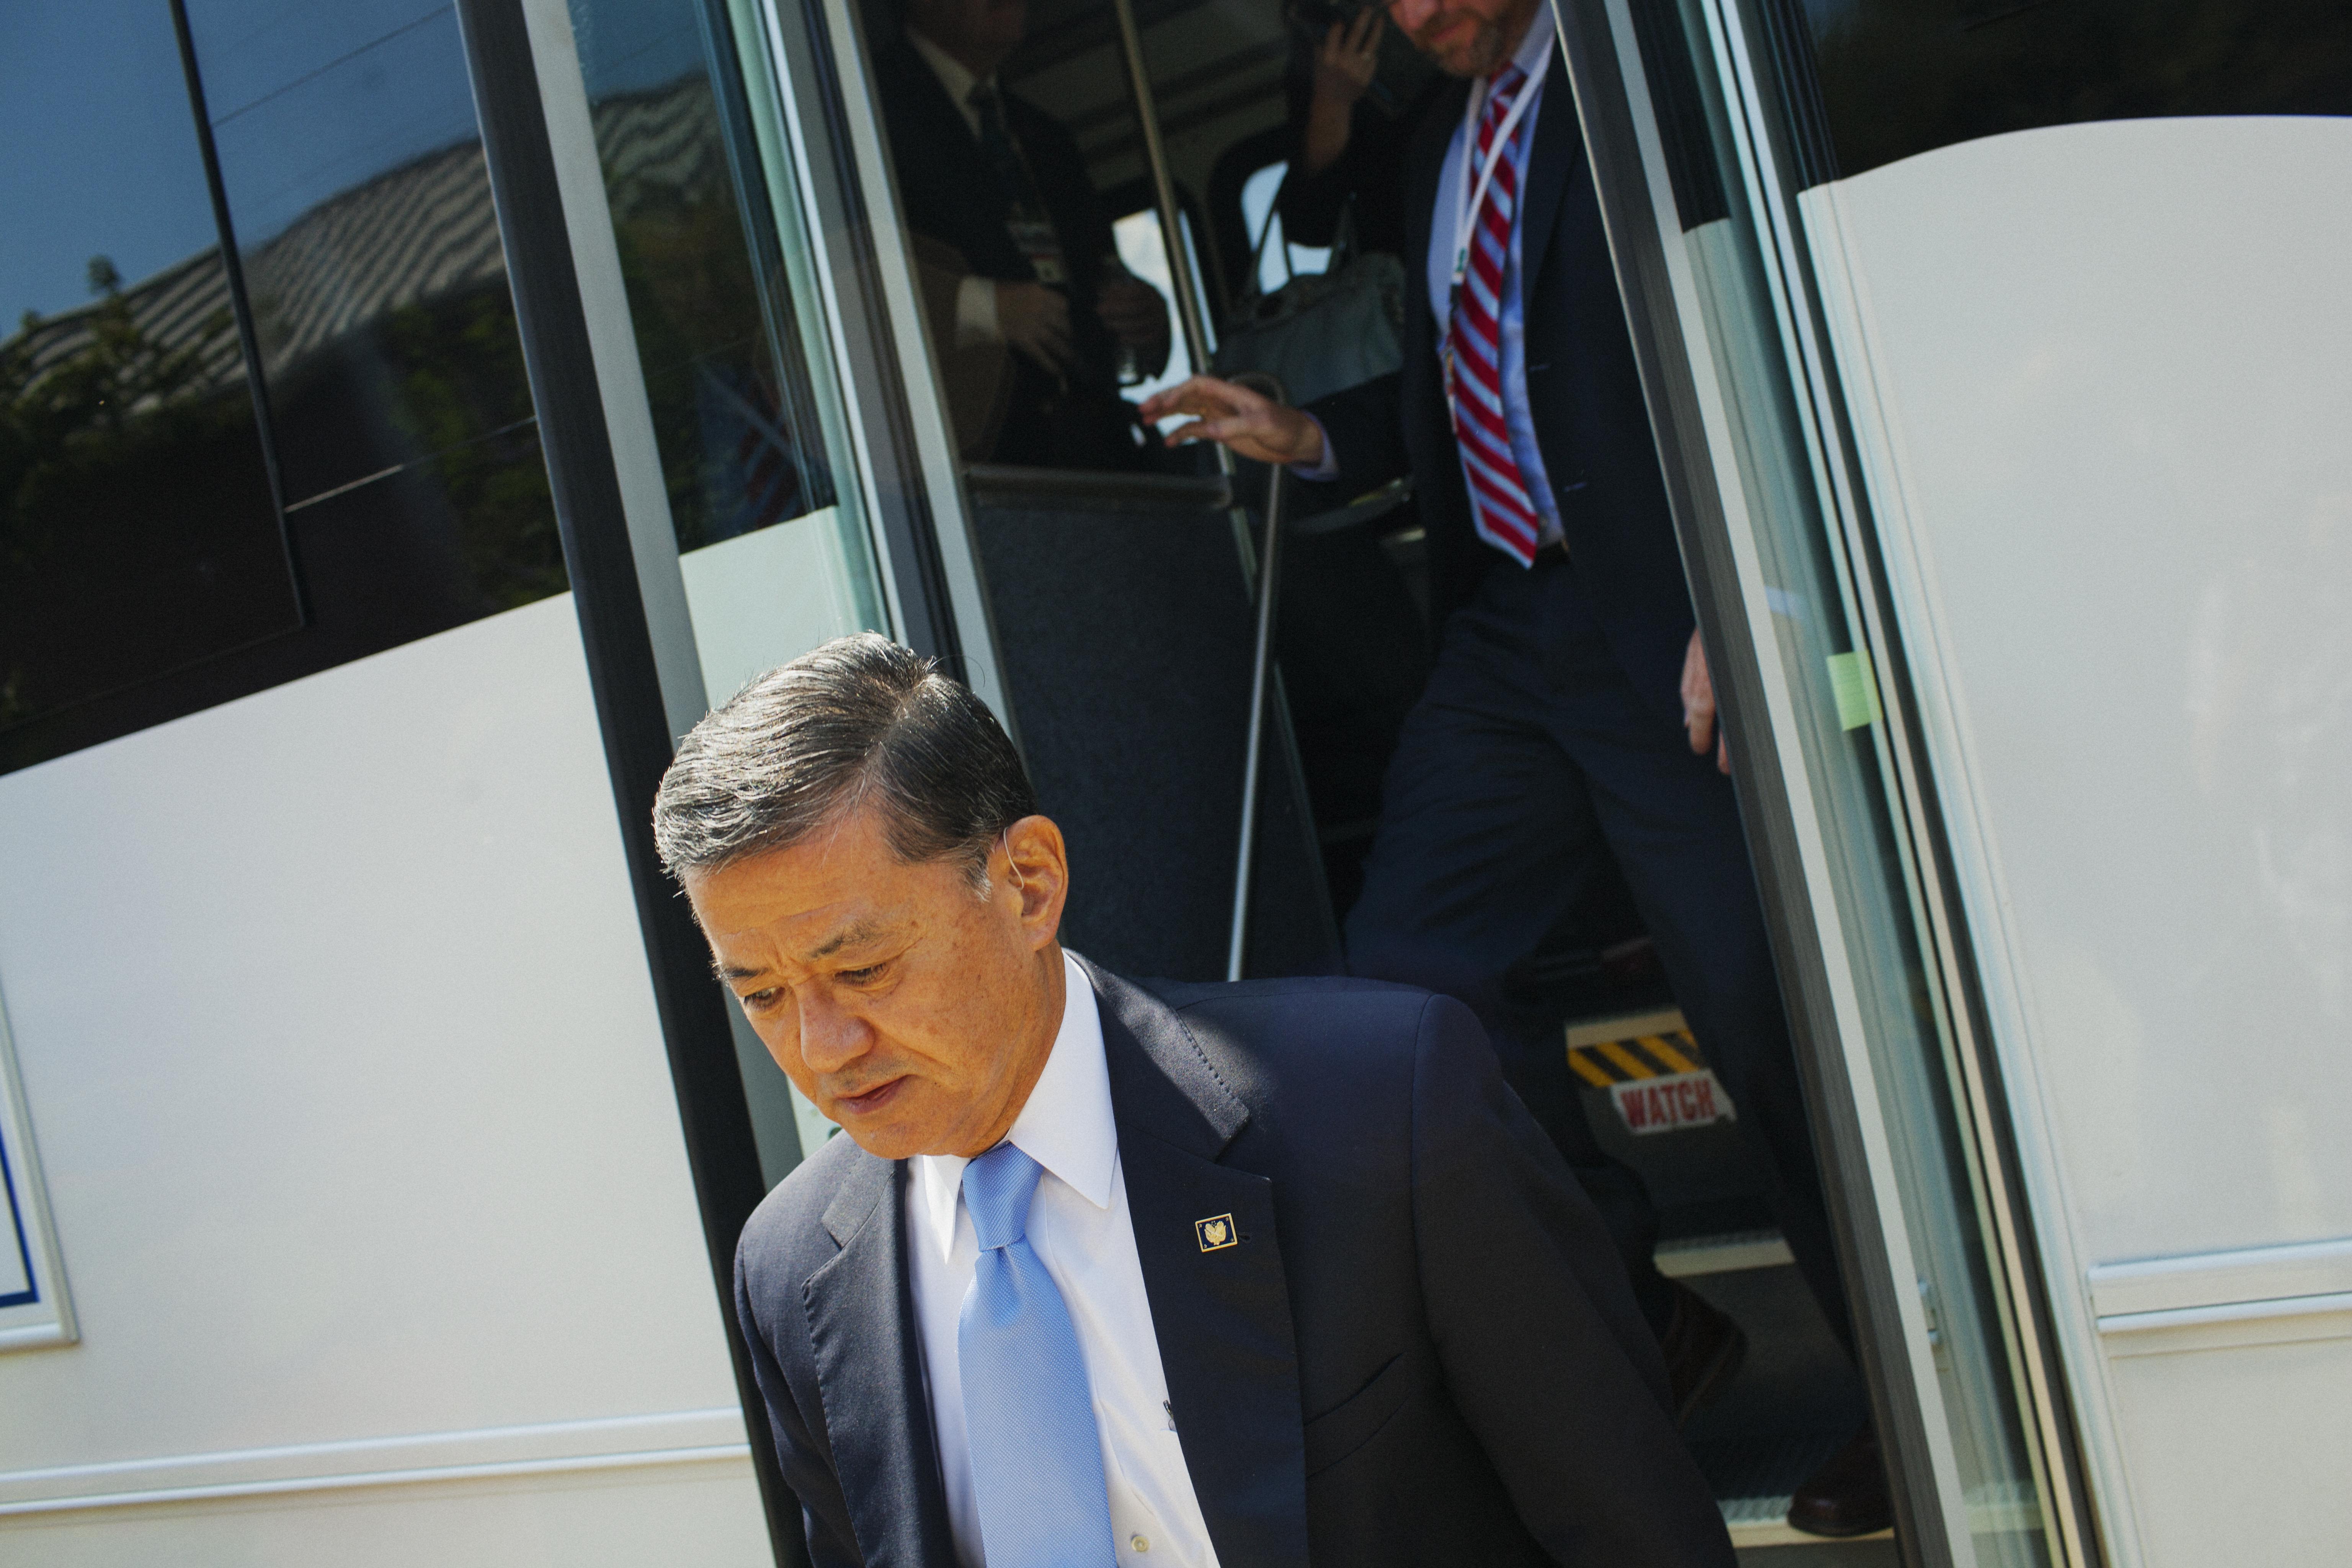 Secretary of Veterans Affairs, Eric K. Shinseki exits a shuttle while being given a tour of the VA Medical Center-Hampton, in Hampton, Virginia.